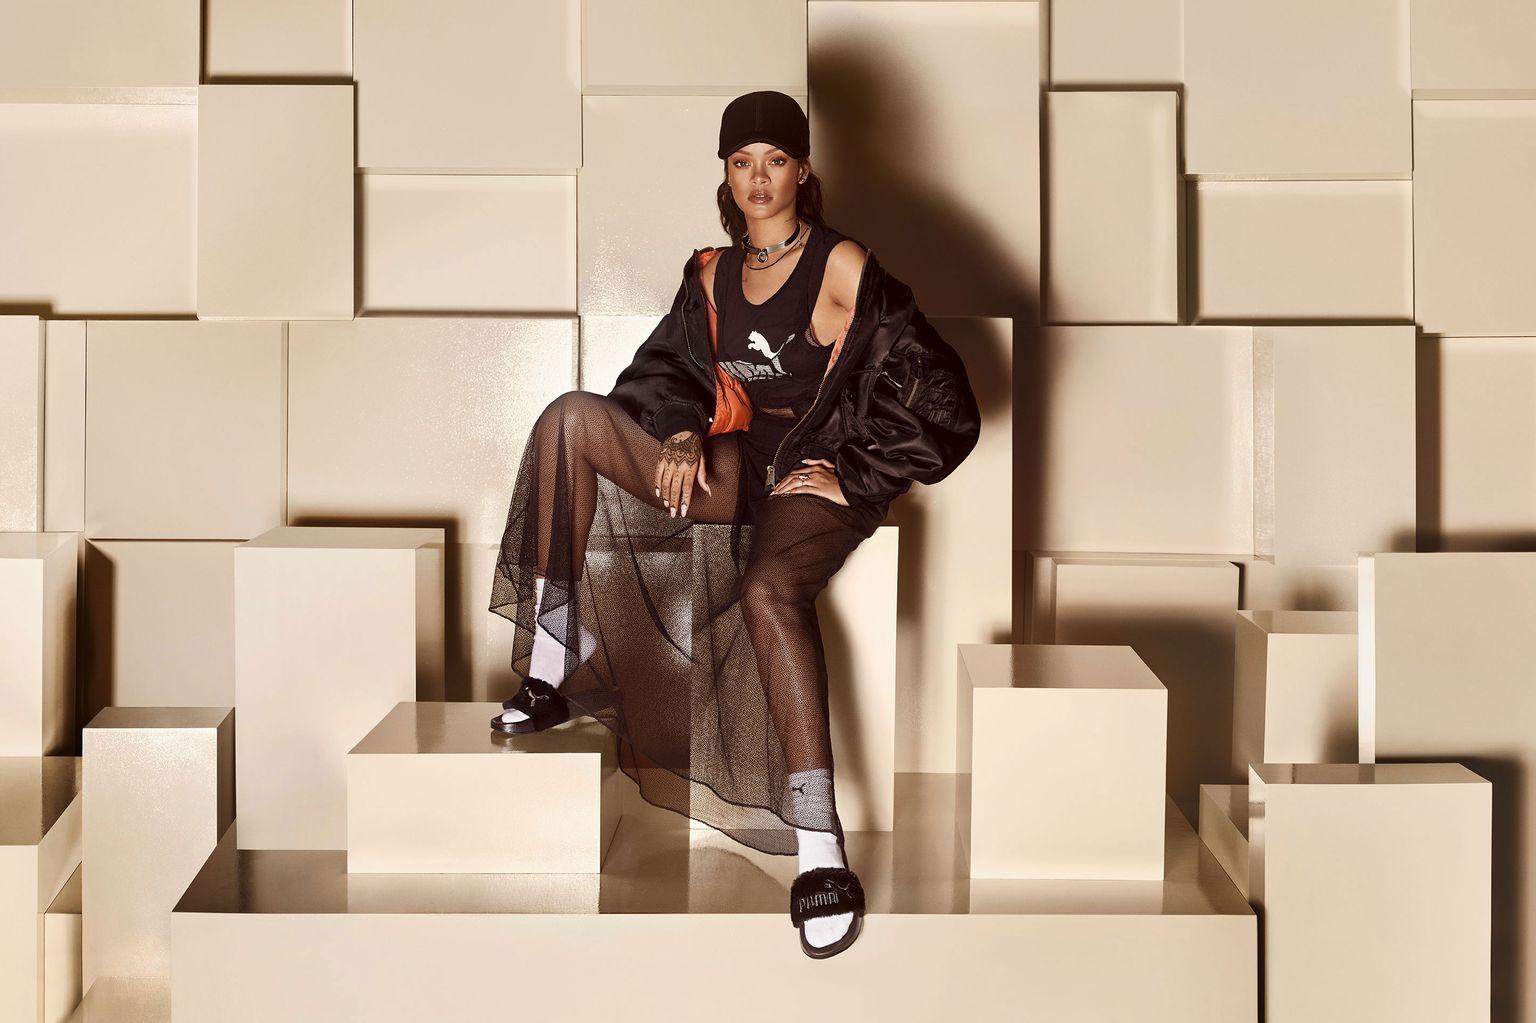 Rihanna Diapositive Fenty Pelliccia Rifornire VLJkP